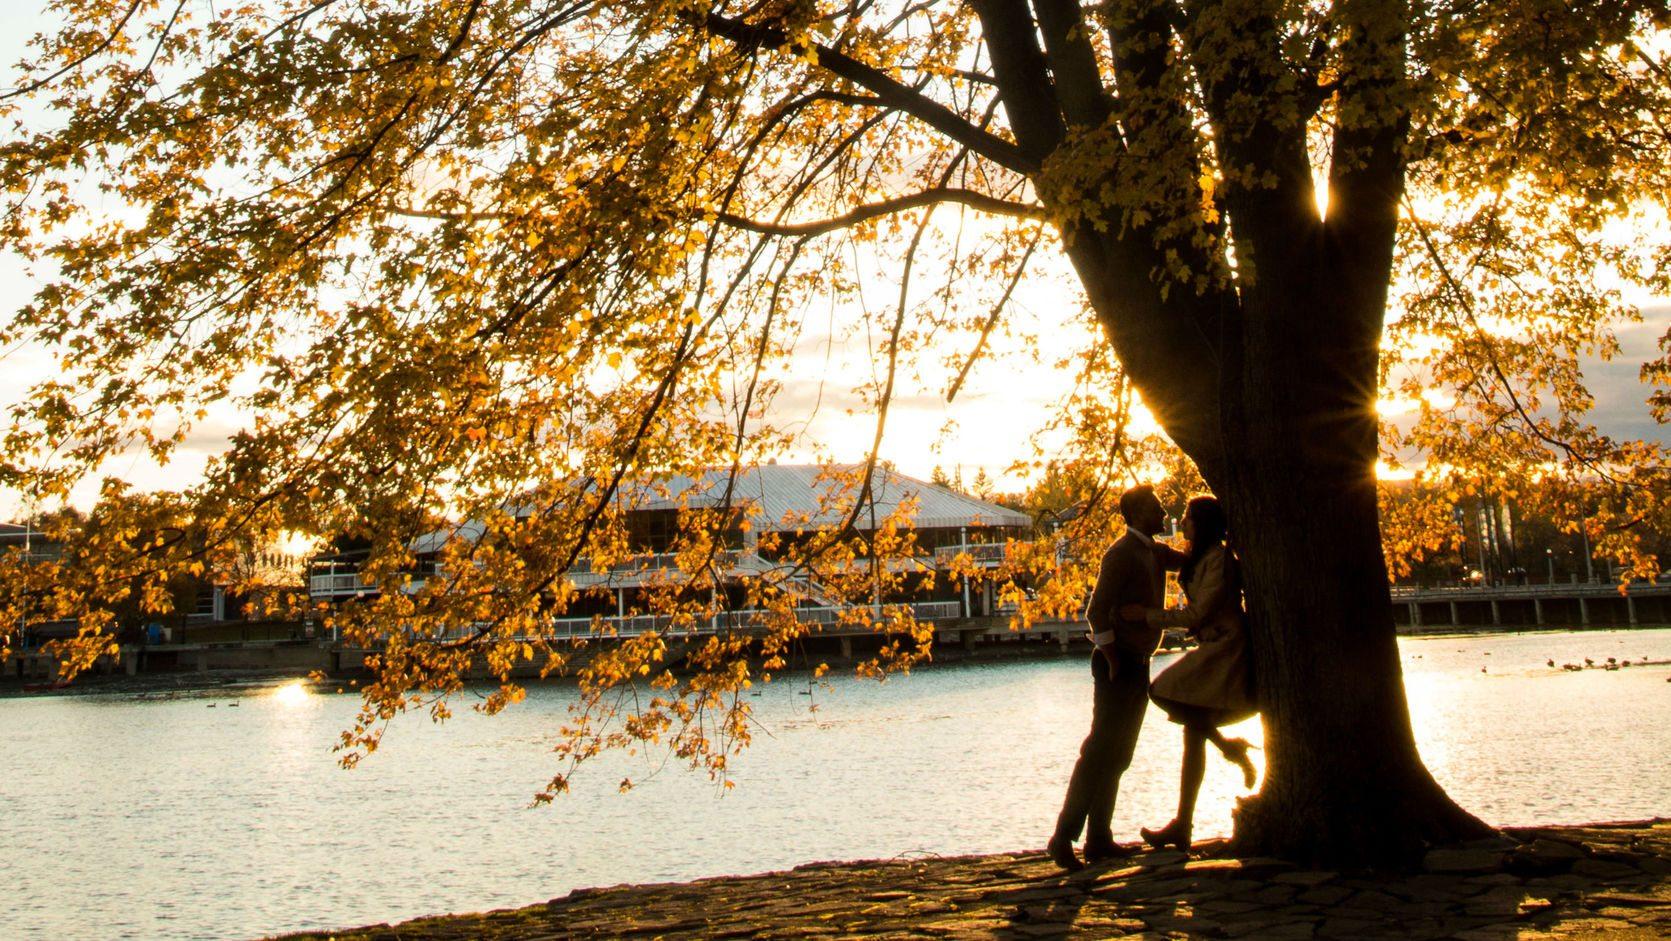 randevúk chanel ékszerek